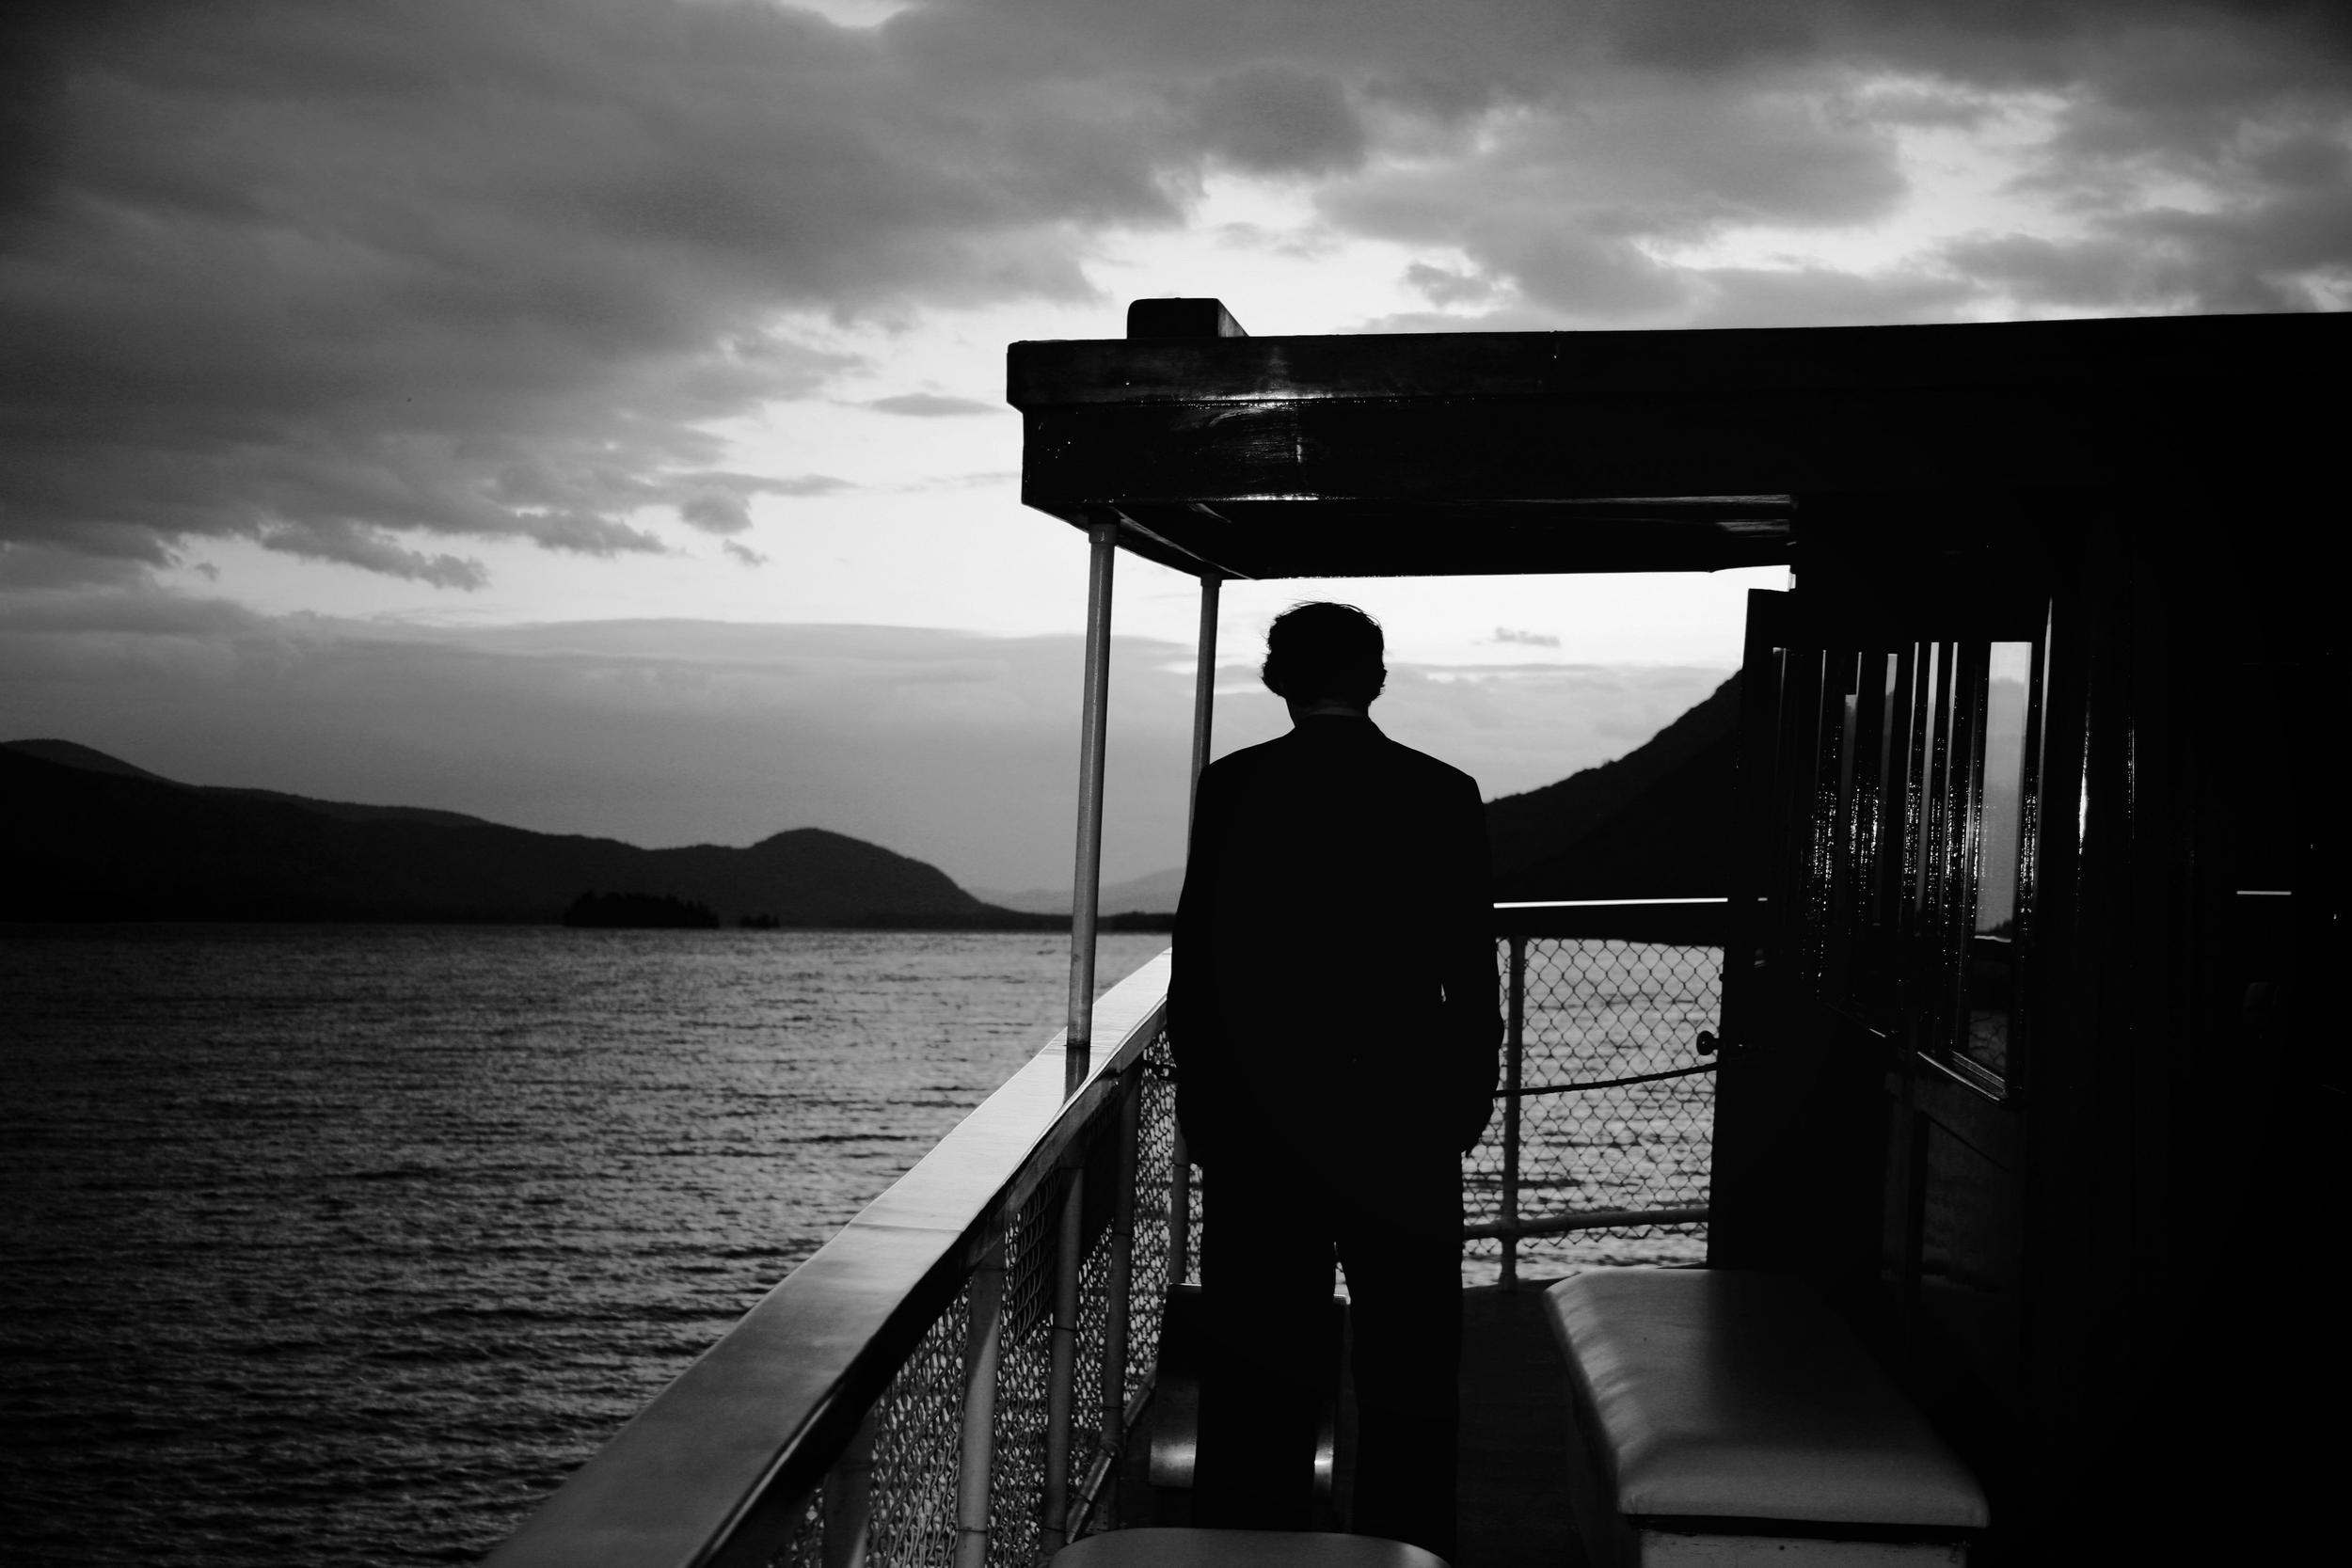 man_alone.jpg